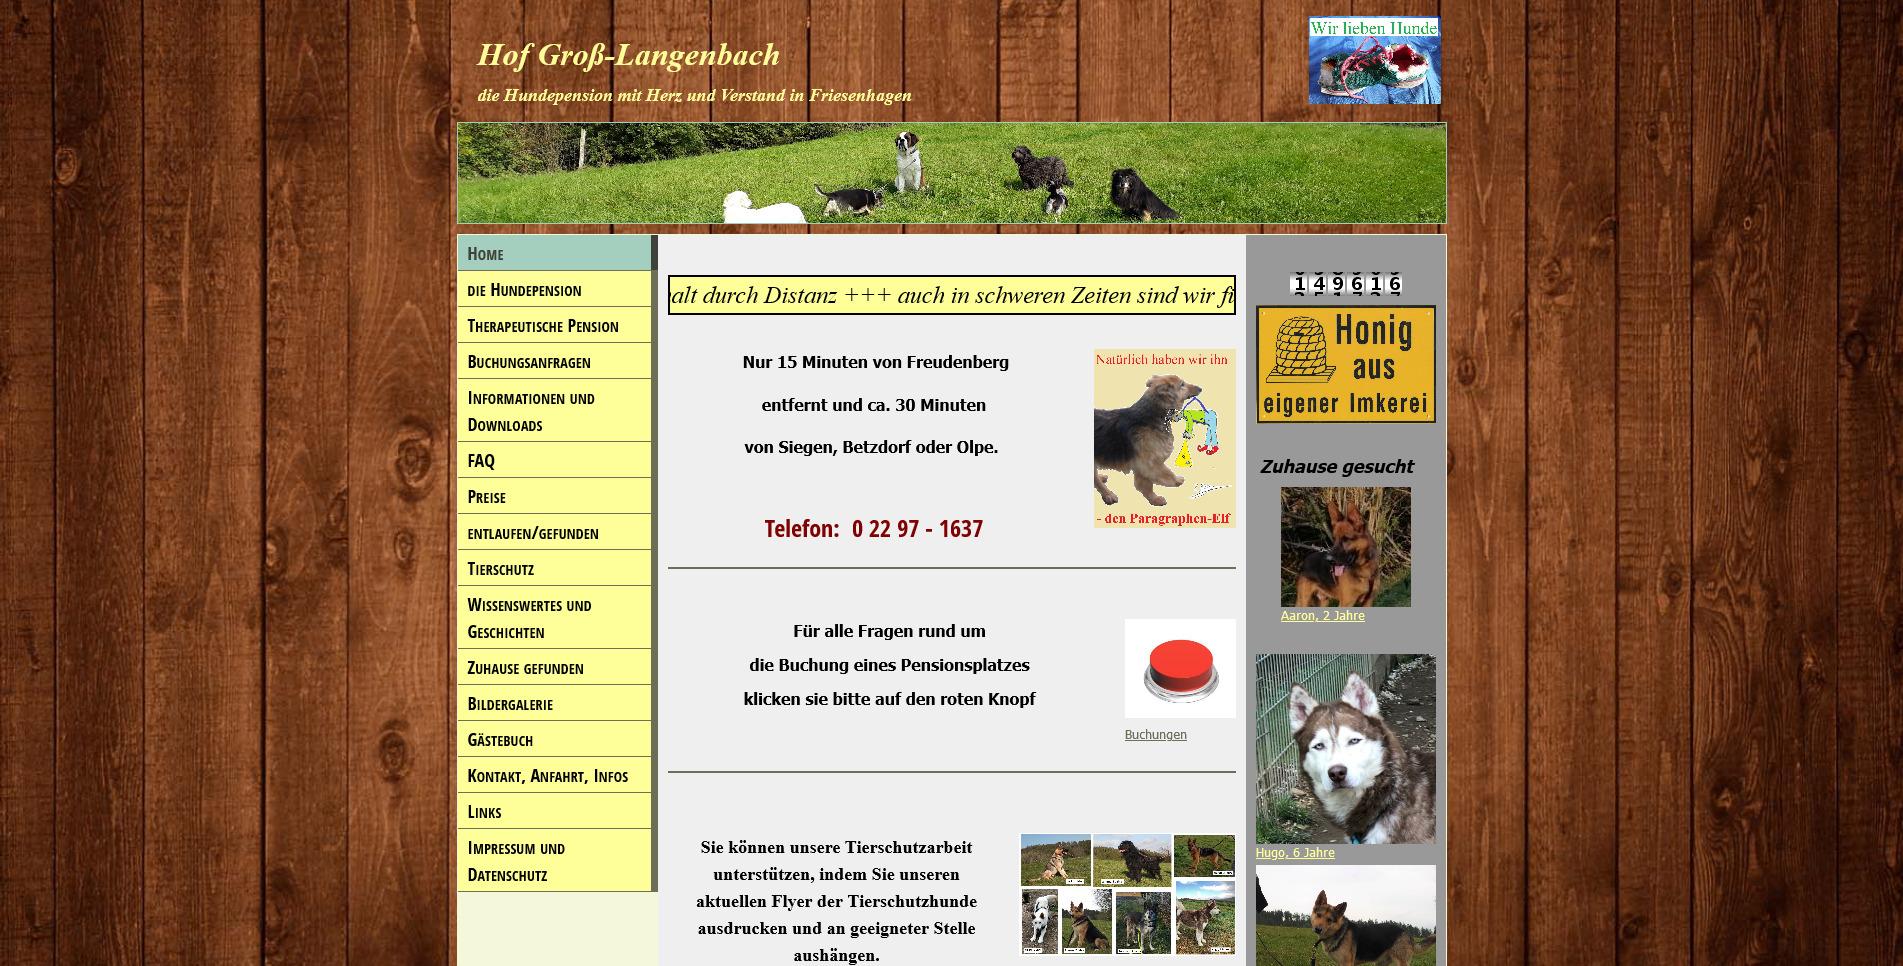 Hundepension Hof Groß-Langenbach